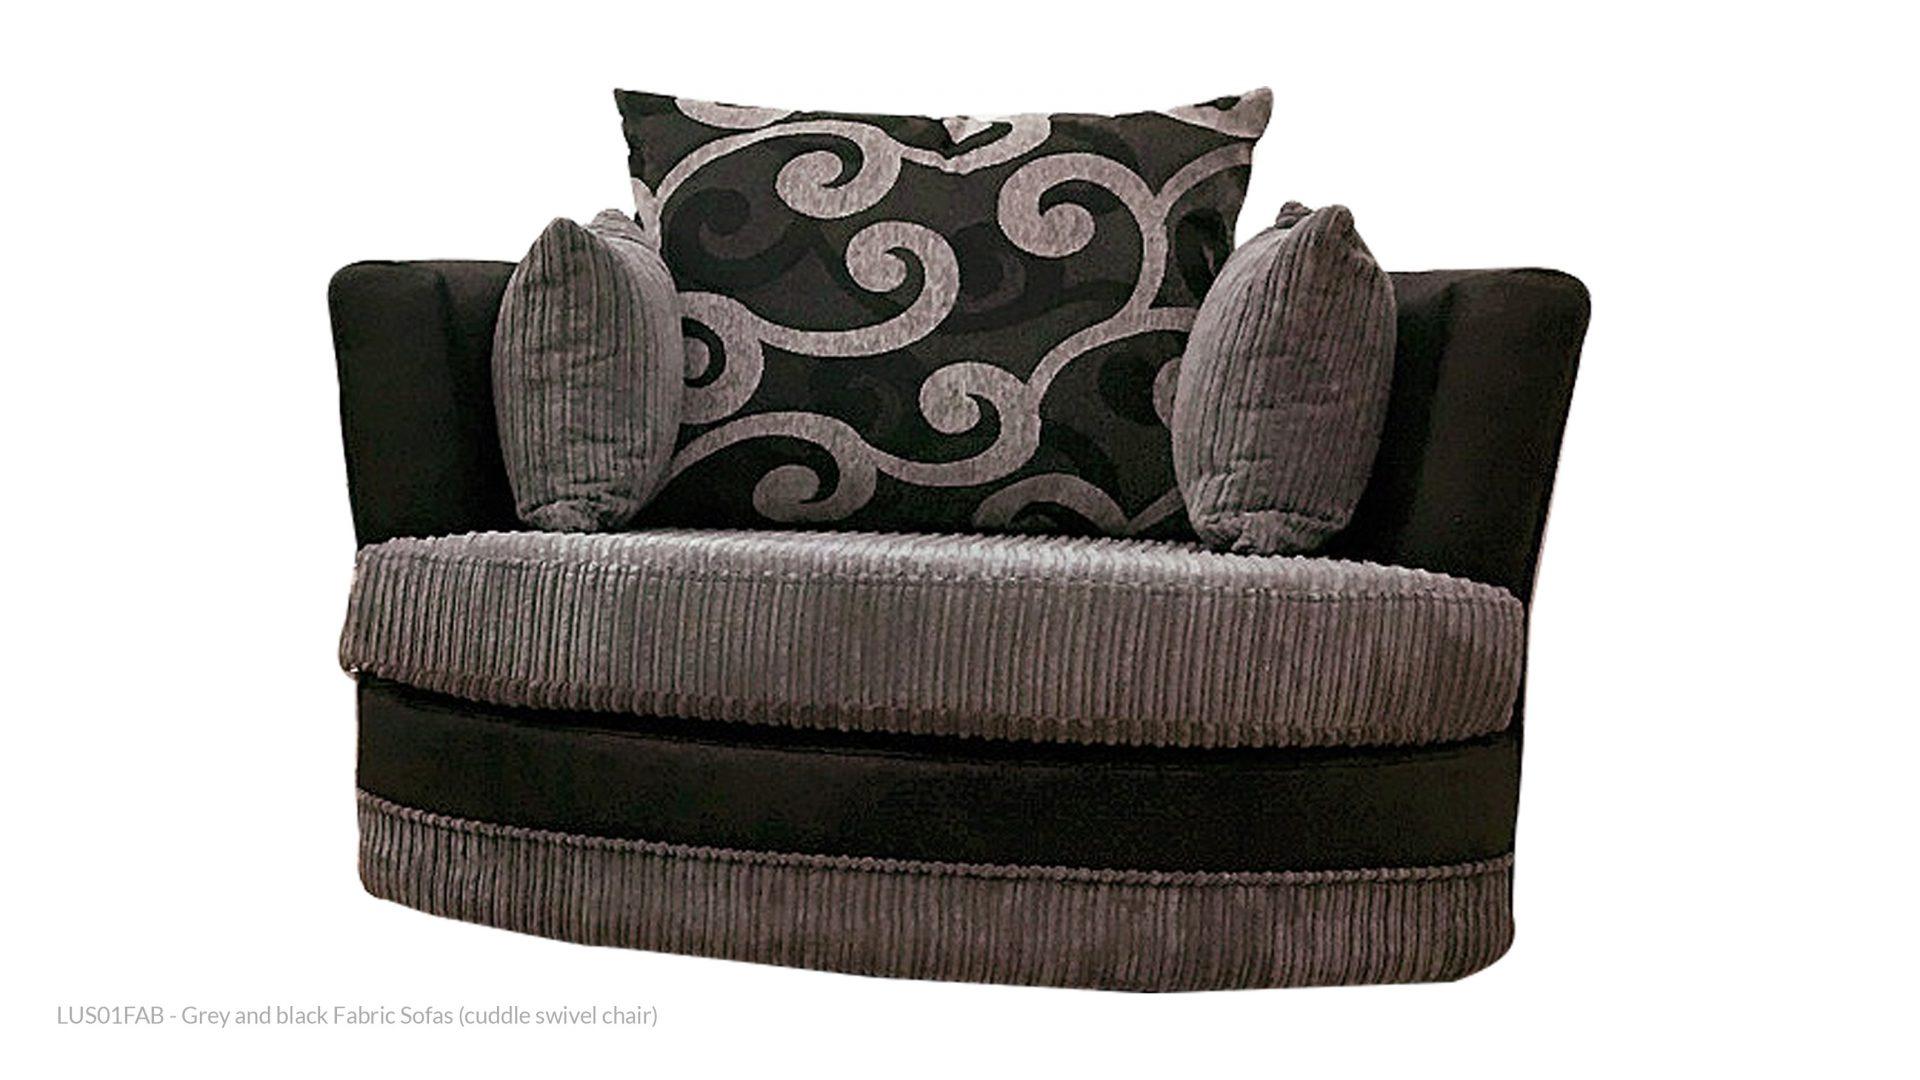 Fabric Sofas Rental Goods